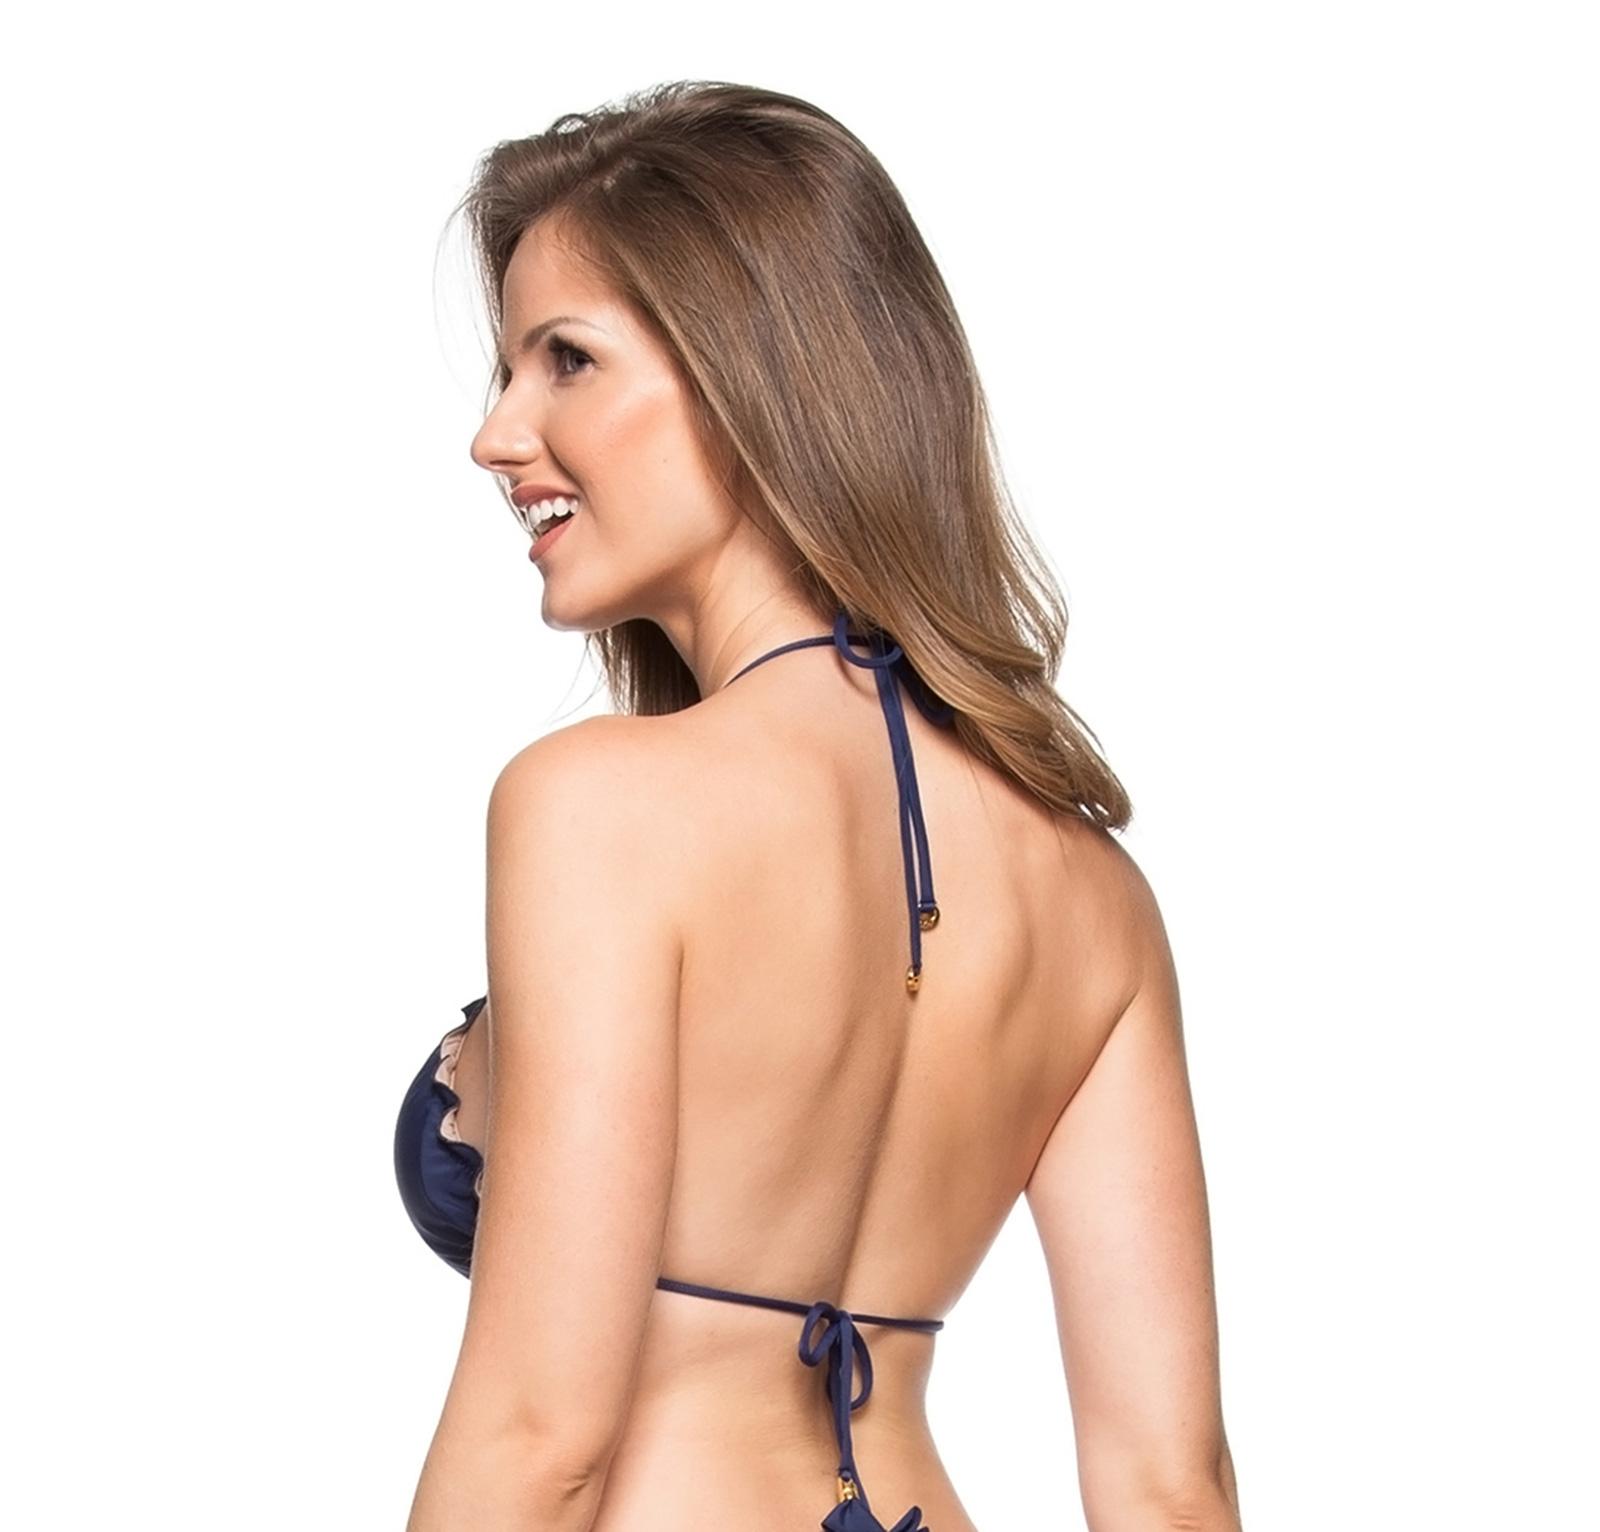 cde697cb014d6 Bikini Tops Navy Blue Bikini Top With Wavy Edges - Top Cor Do Mar